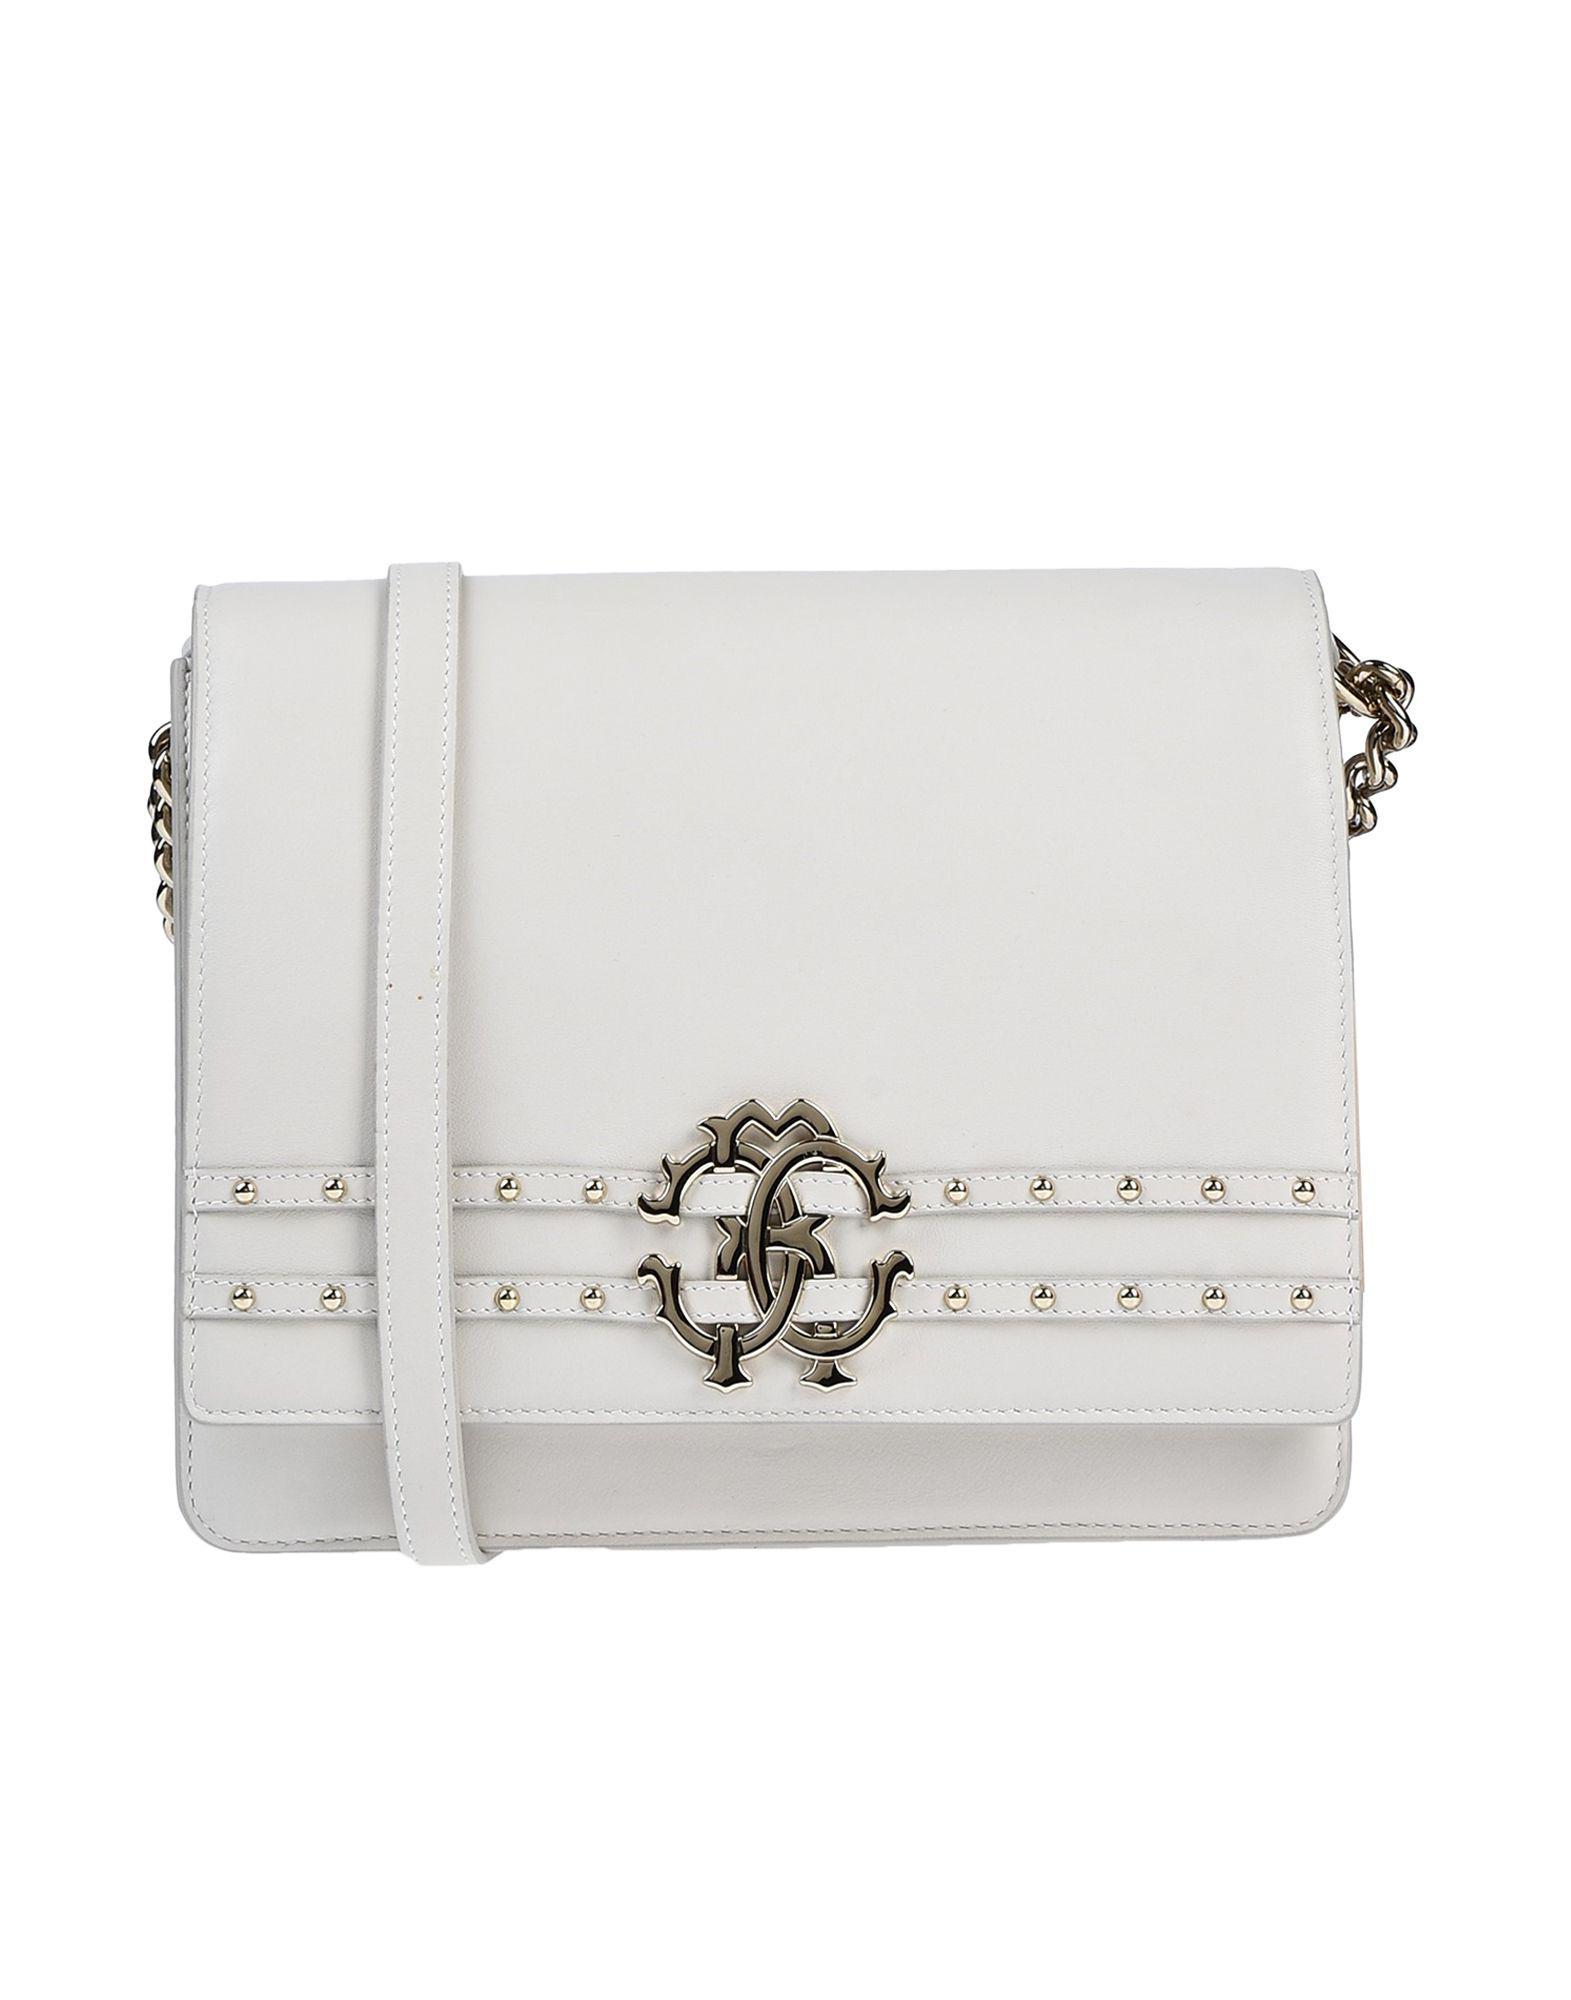 6bcd7e3558a Lyst - Roberto Cavalli Cross-body Bag in White